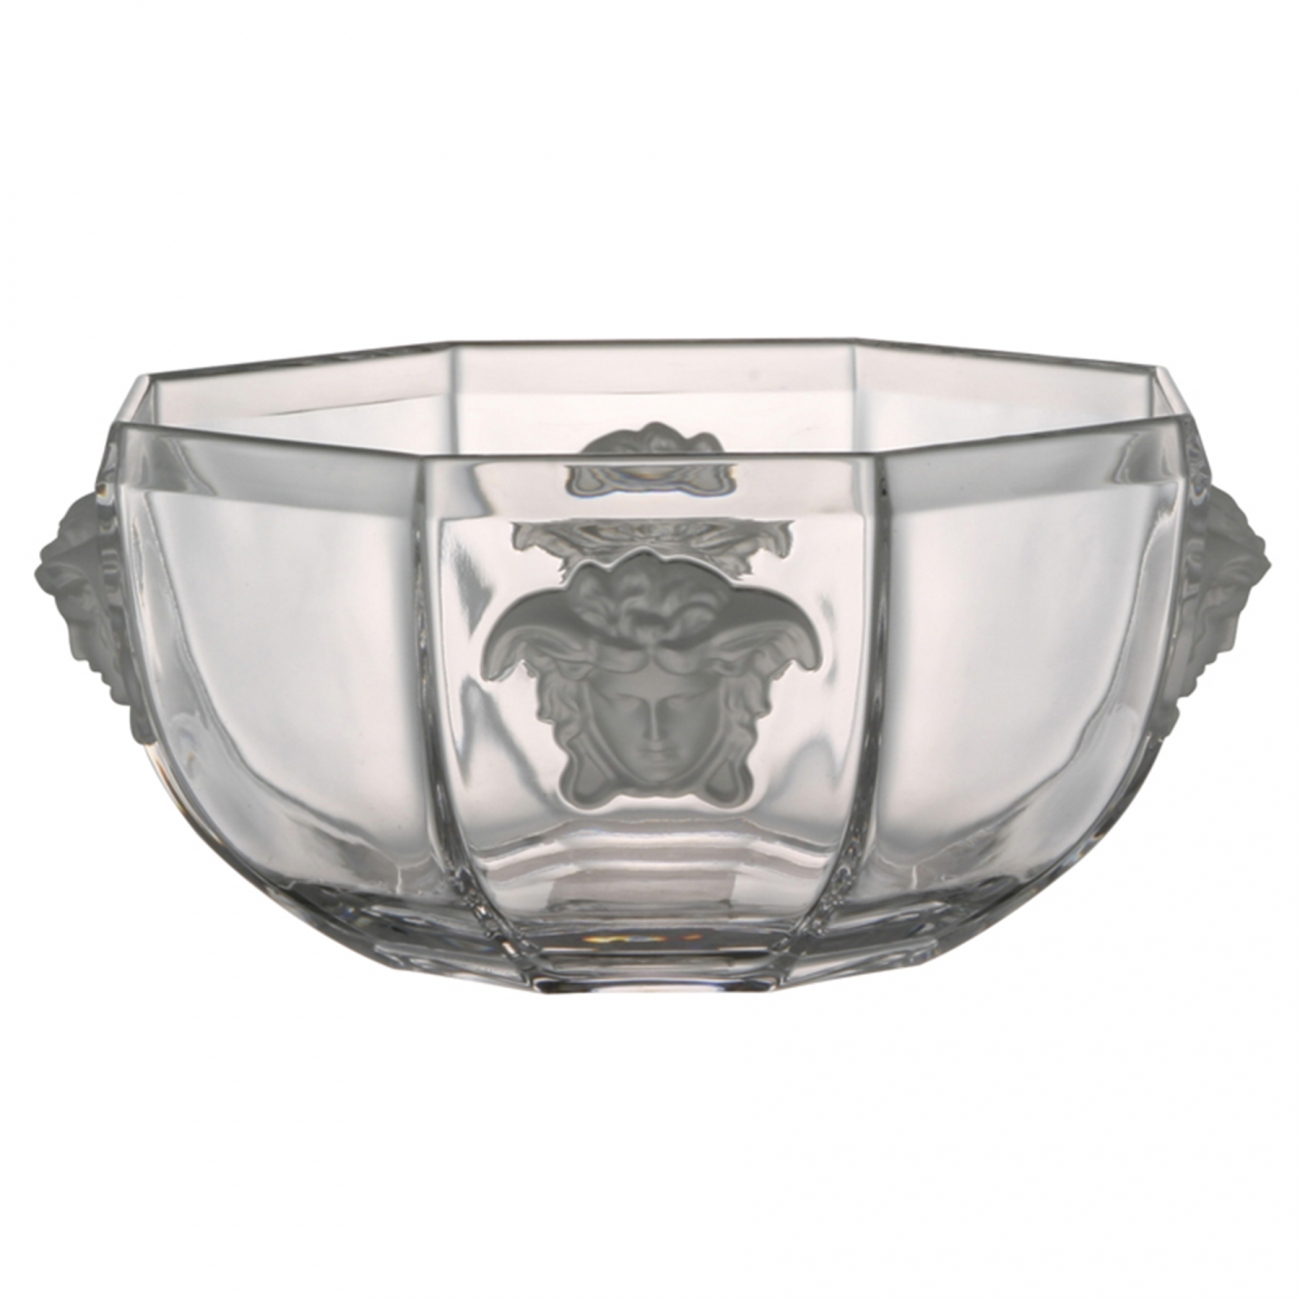 Rosenthal Versace Medusa Lumière Coppa 18 cm